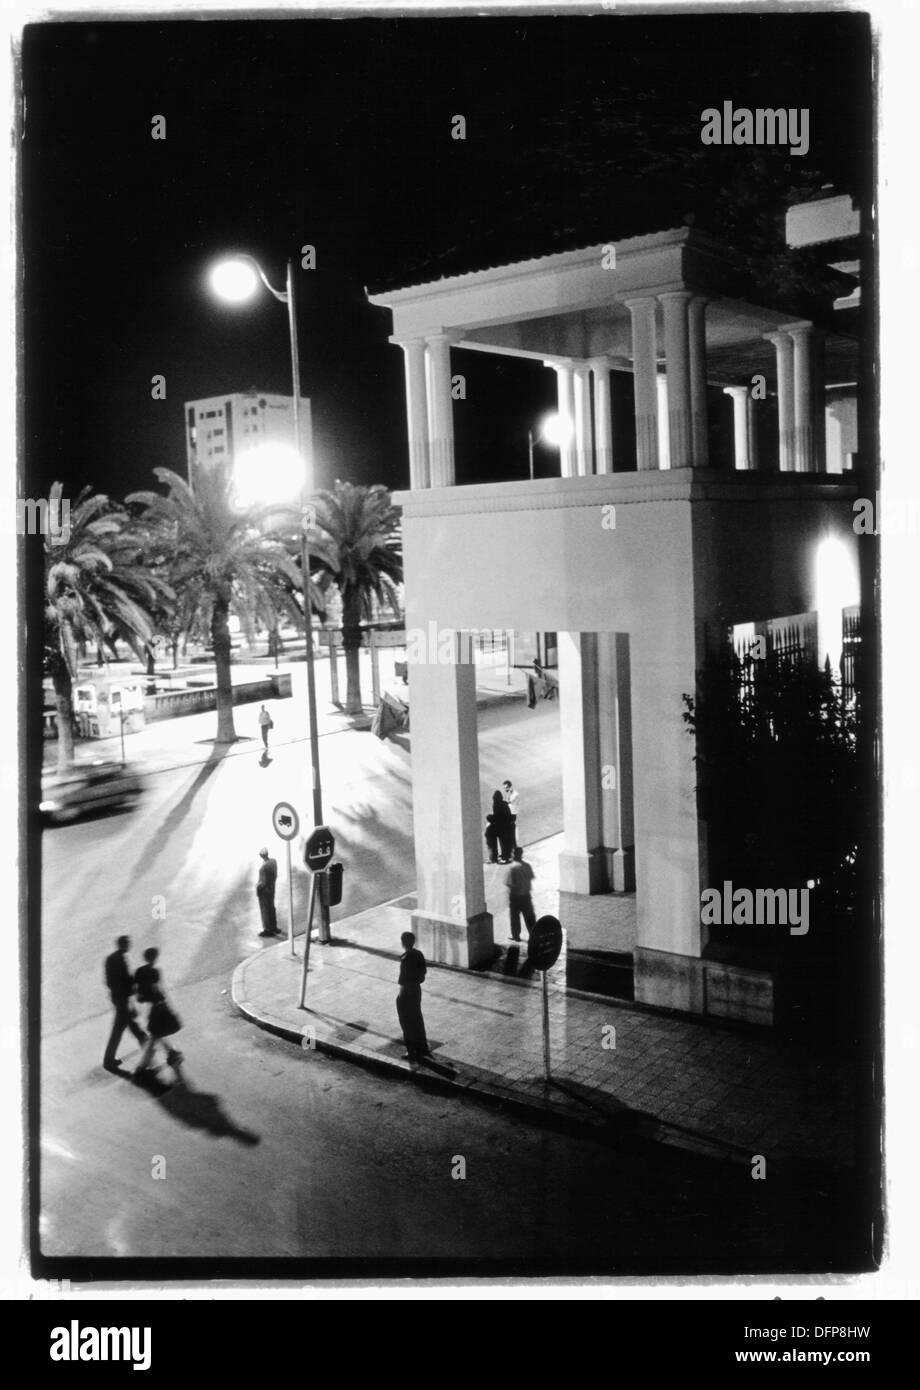 Hotel Amor (´Love Hotel´). Fes. Morocco - Stock Image